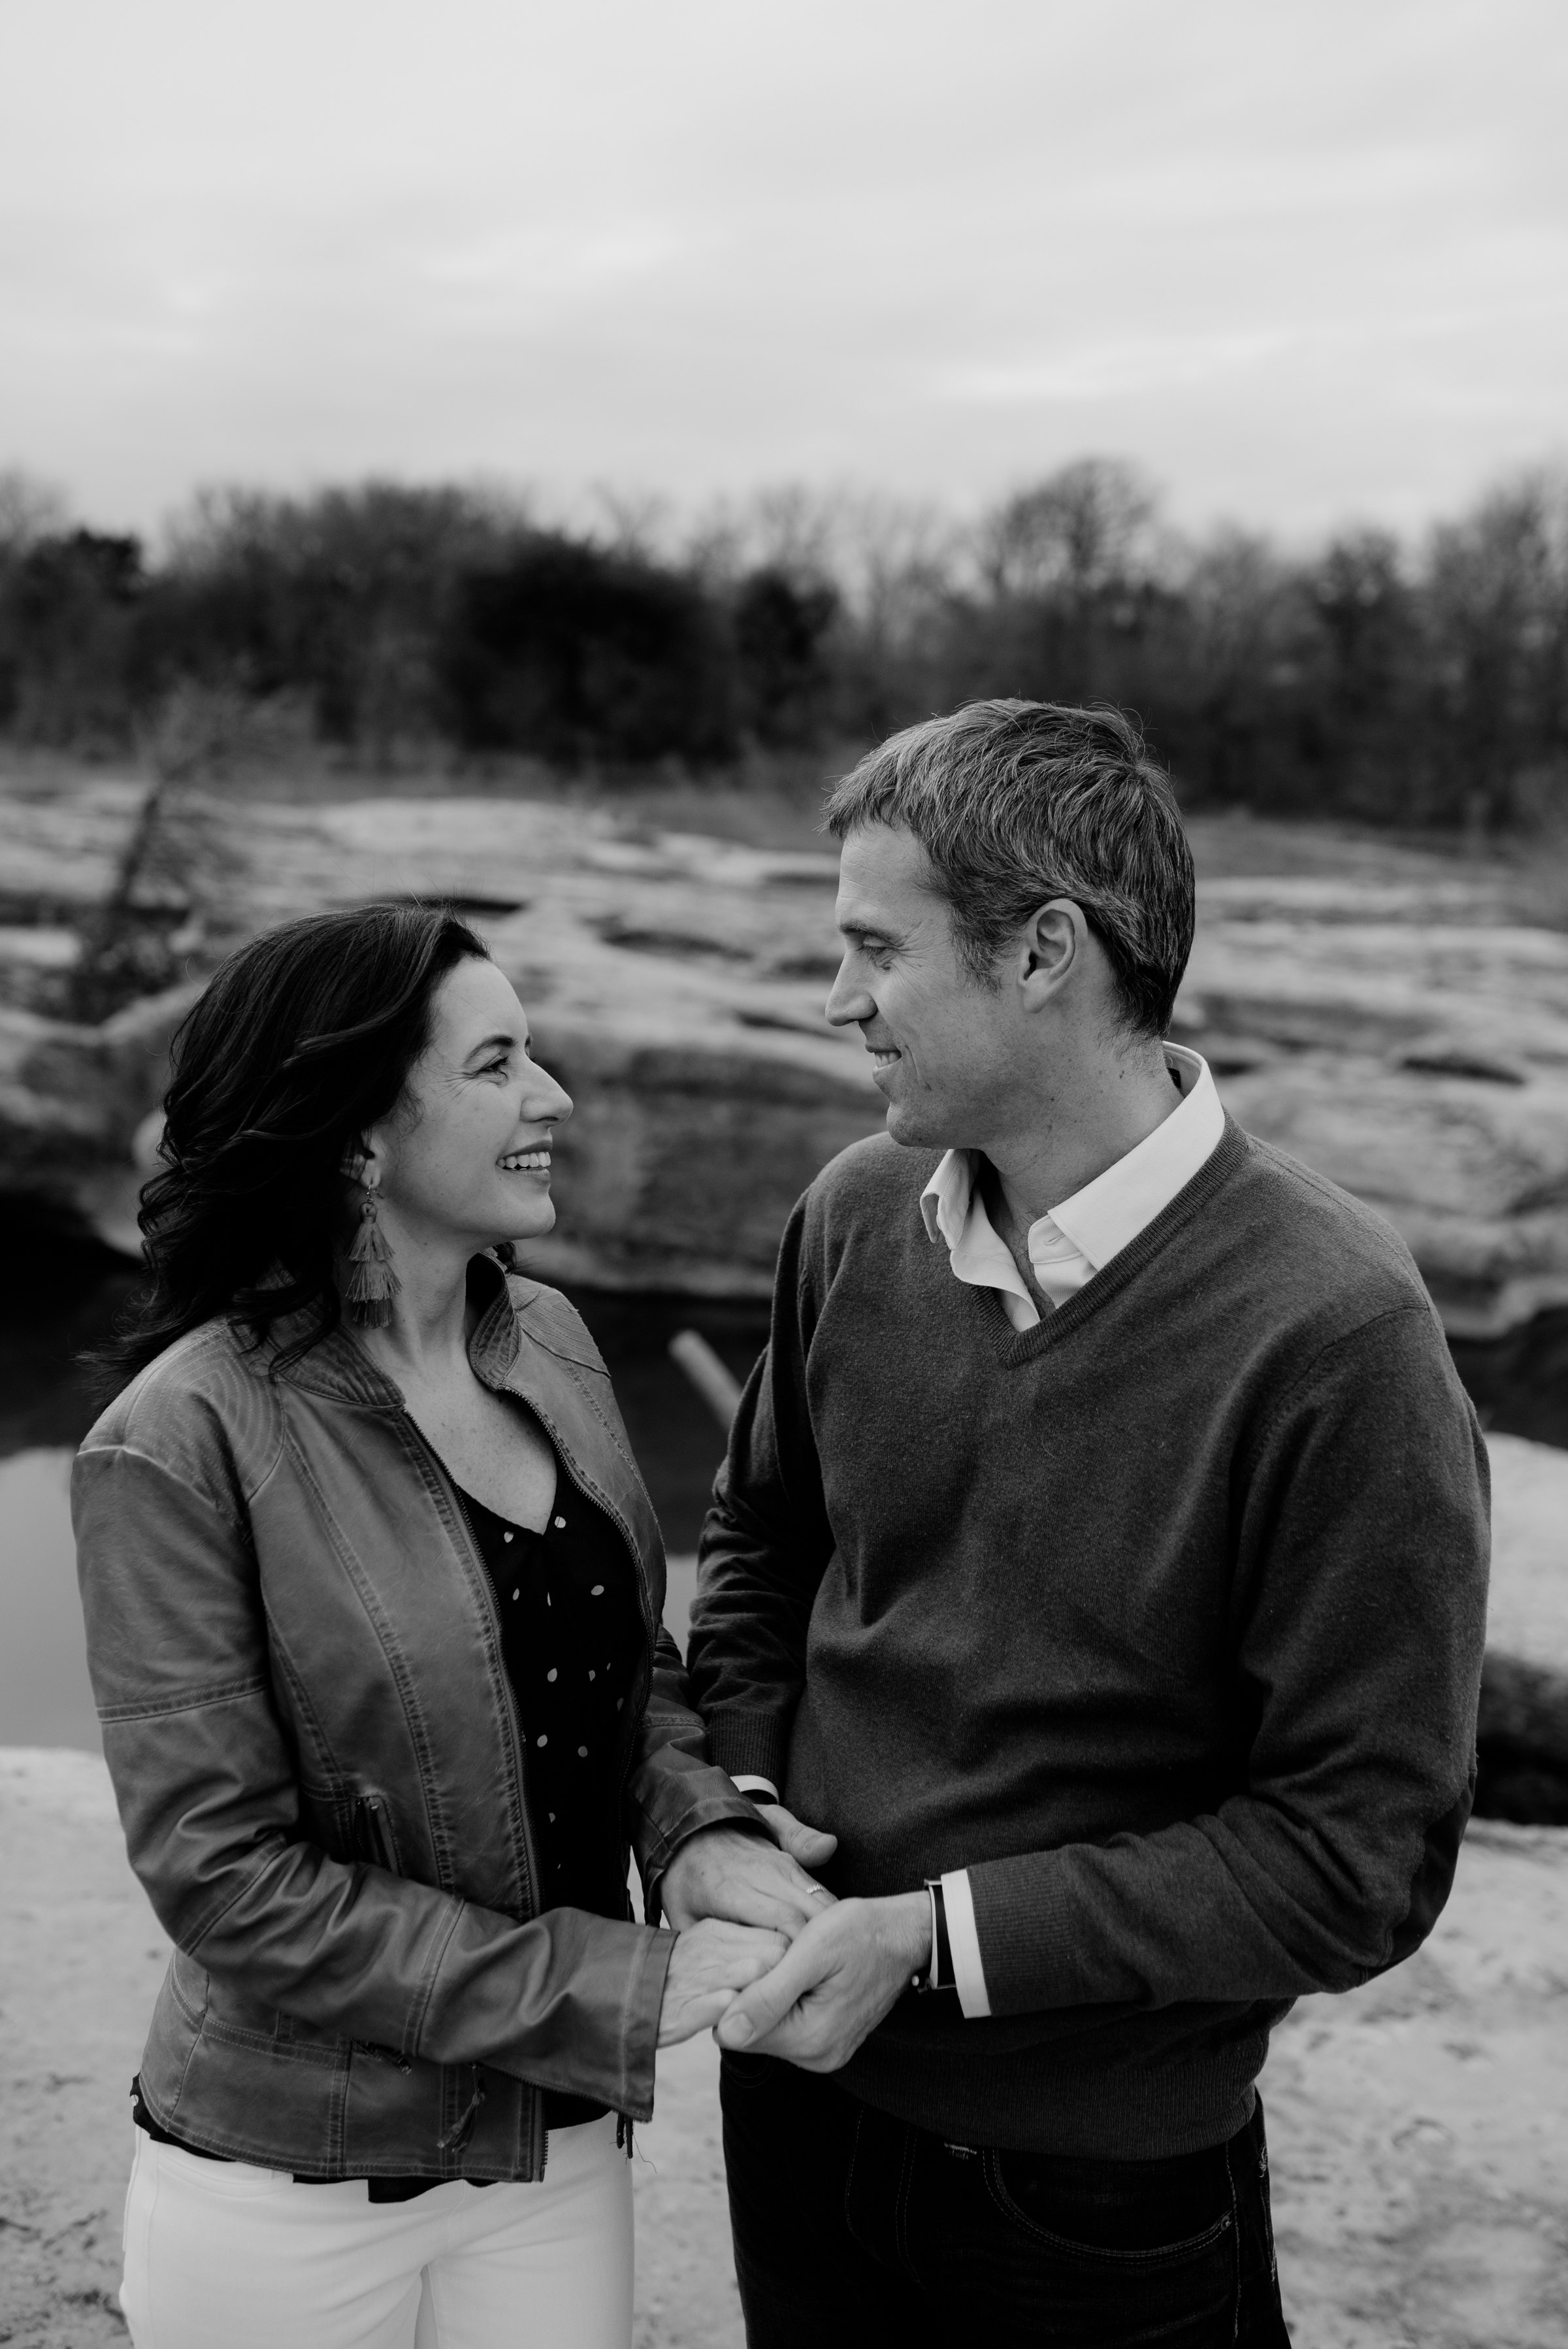 austin-mckinney-falls-engagement-photographer-elopement-prices-best-headshot-senior-adventurous-italy-minneapolis-texas-minnesota-dallas-houston-tulum-mexico_0035.jpg